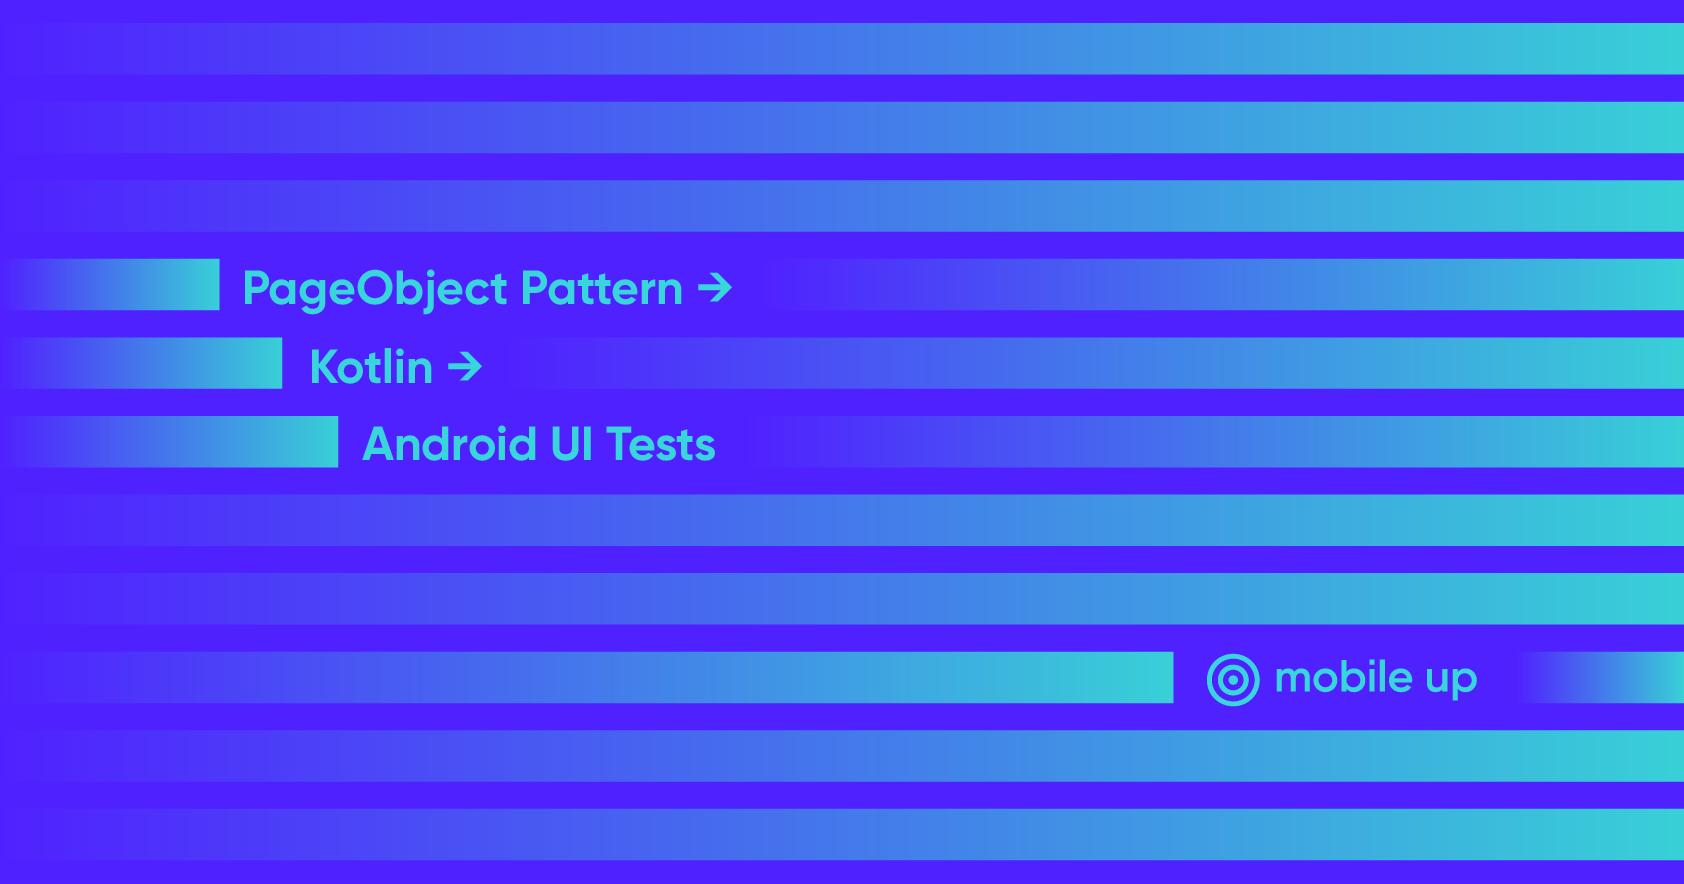 [Перевод] Паттерн PageObject в Kotlin для UI-тестирования Android